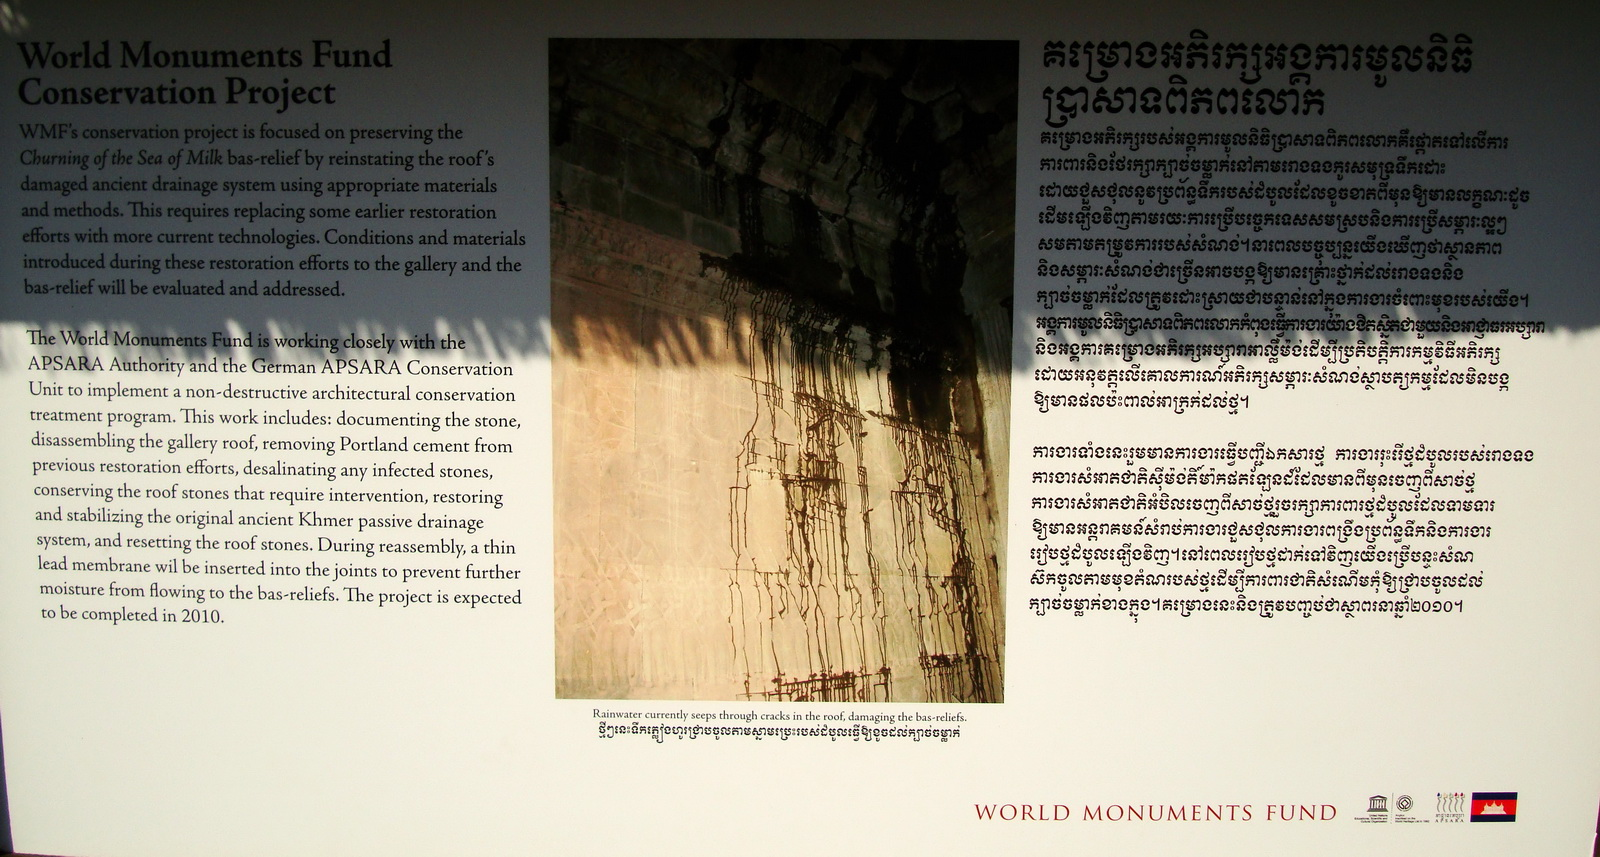 1 Angkor Wat notice board Churning of the sea of milk 0C